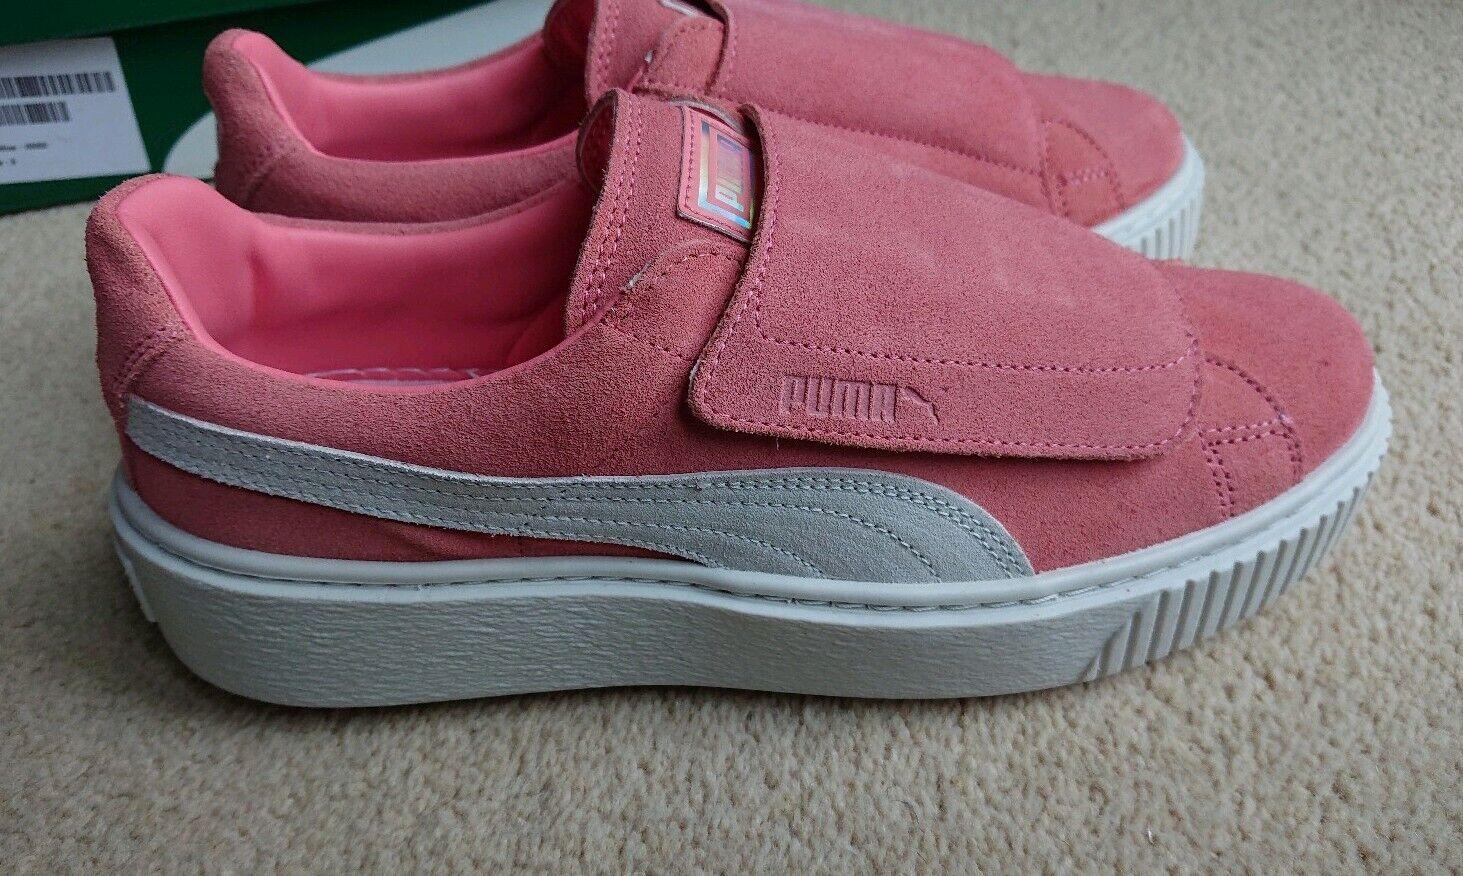 Puma Women's Suede Platform Core Ankle-High Fashion Sneaker SIZE 5